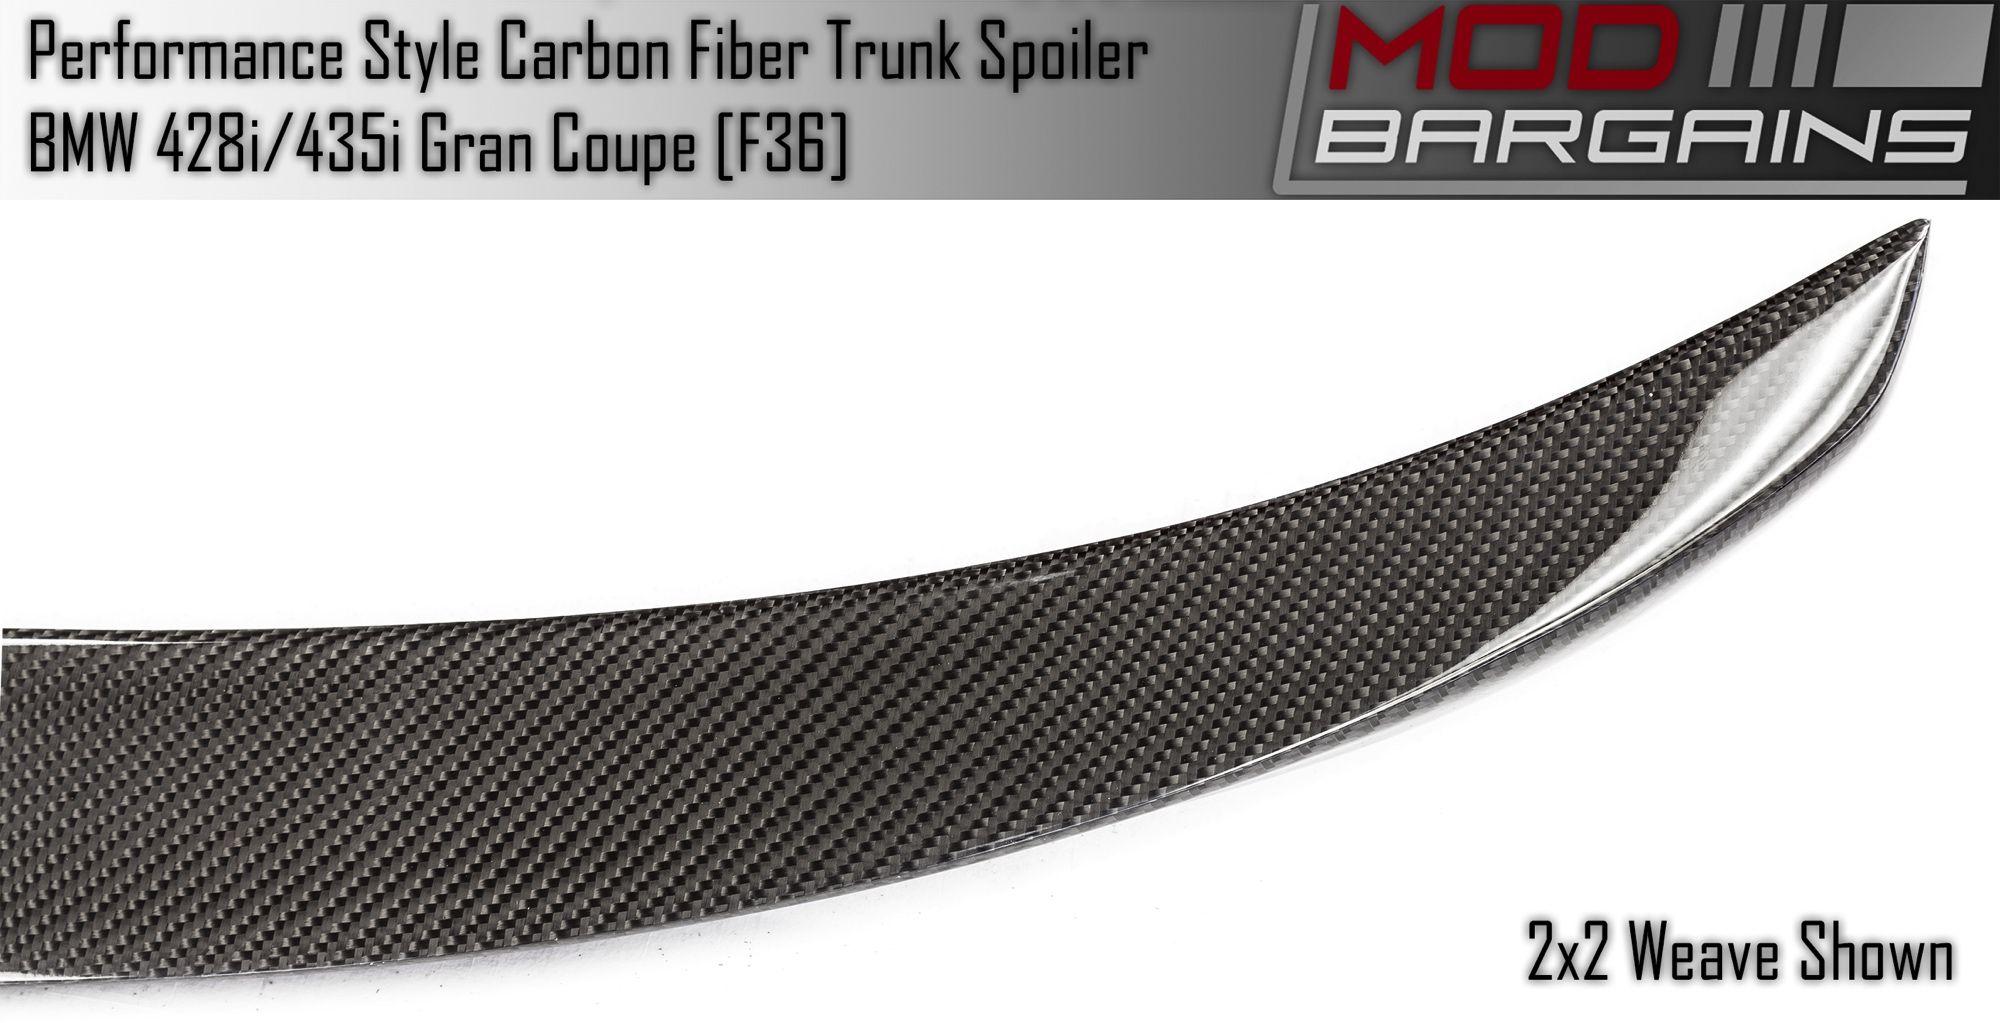 Carbon Fiber Performance Style Trunk Spoiler BMTS3601